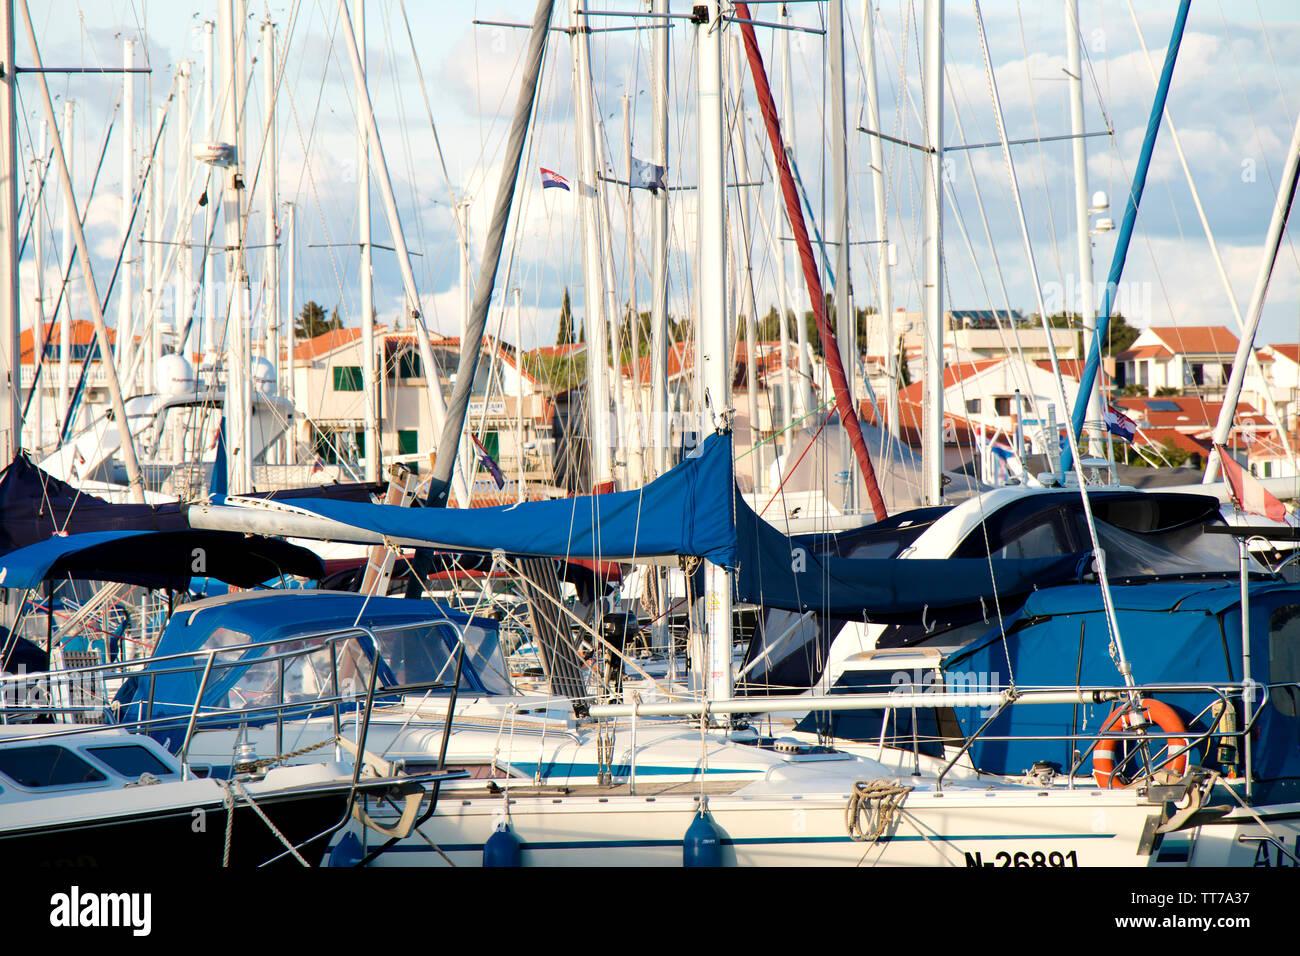 Vodice, Croatia - April 30, 2019: Sailing boats and fast boats anchored in marina in Adriaic sea - Stock Image